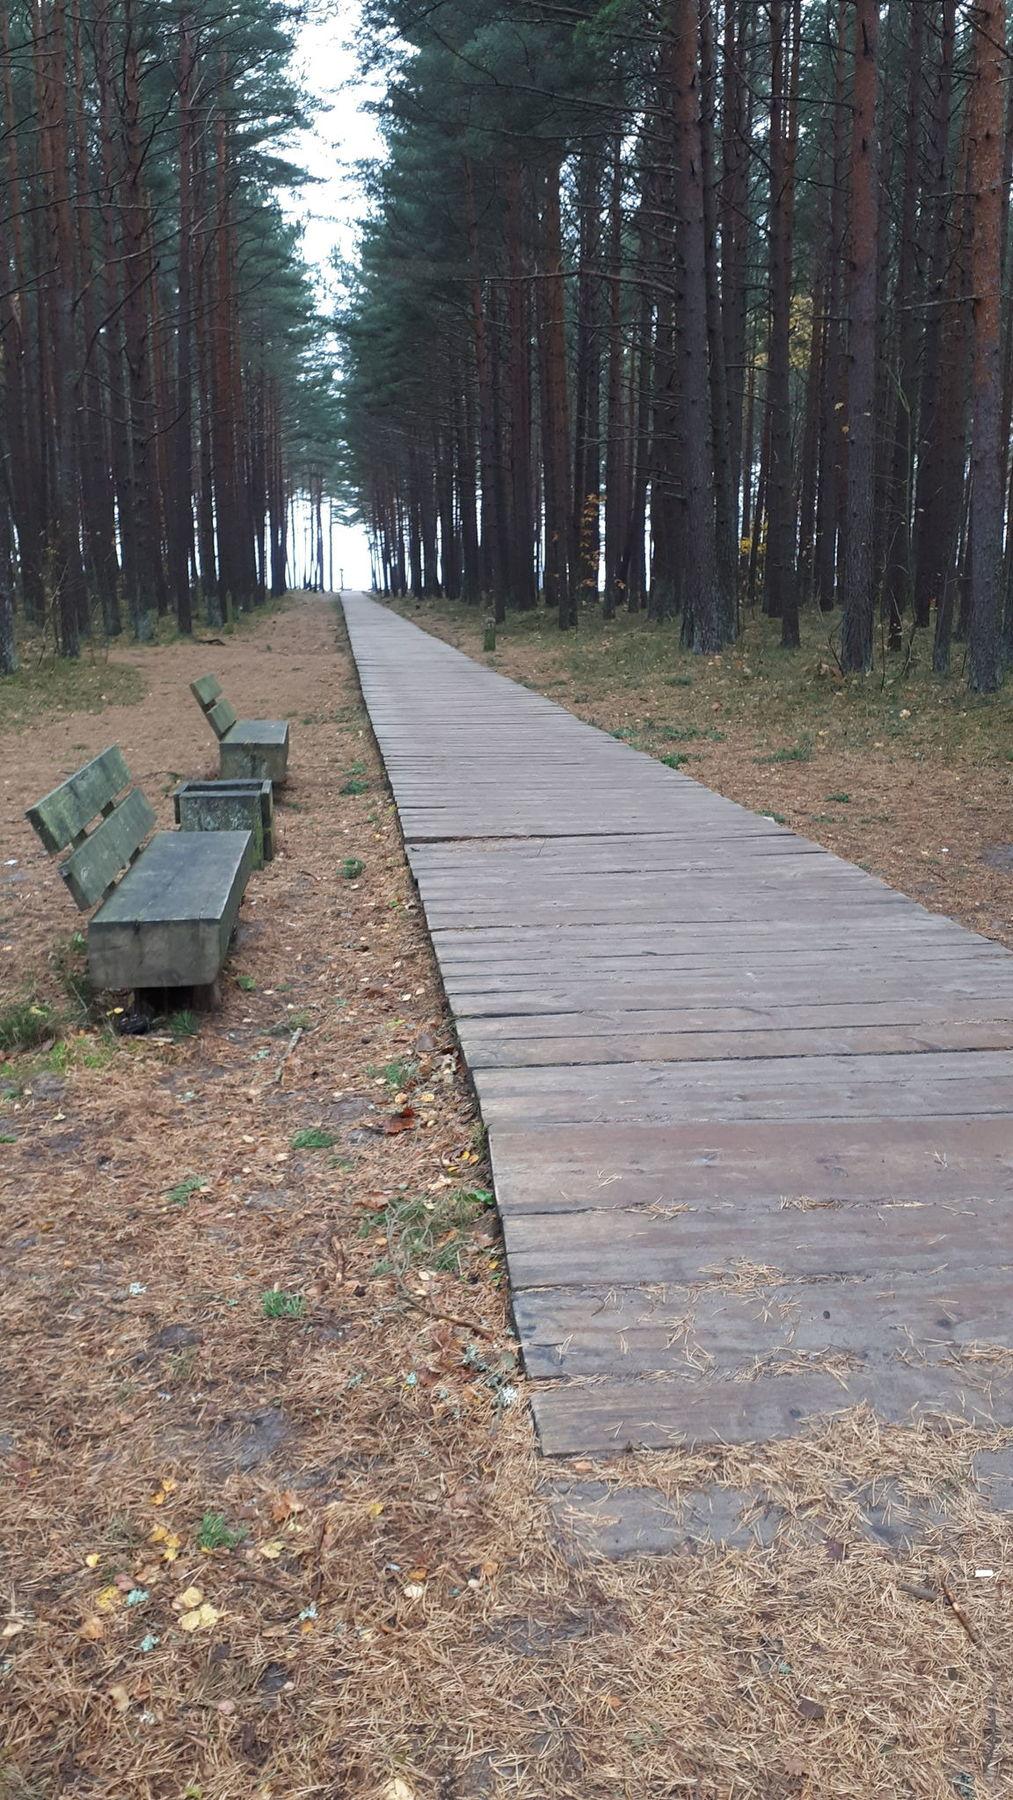 Litorina_Trail_to_Olando_kepur_